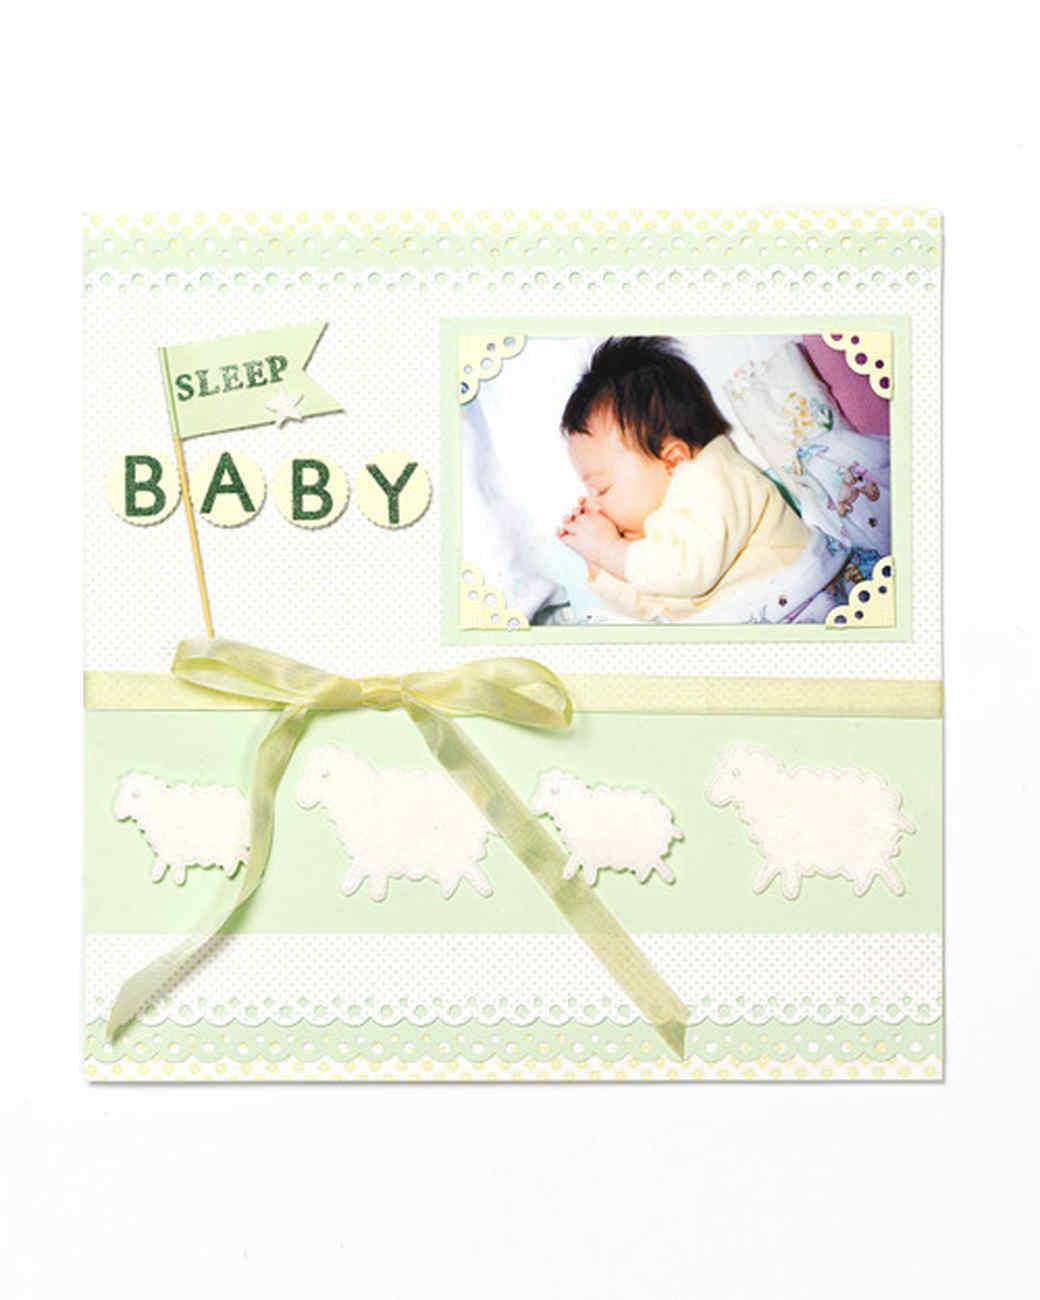 Sleep Baby Scrapbook Page